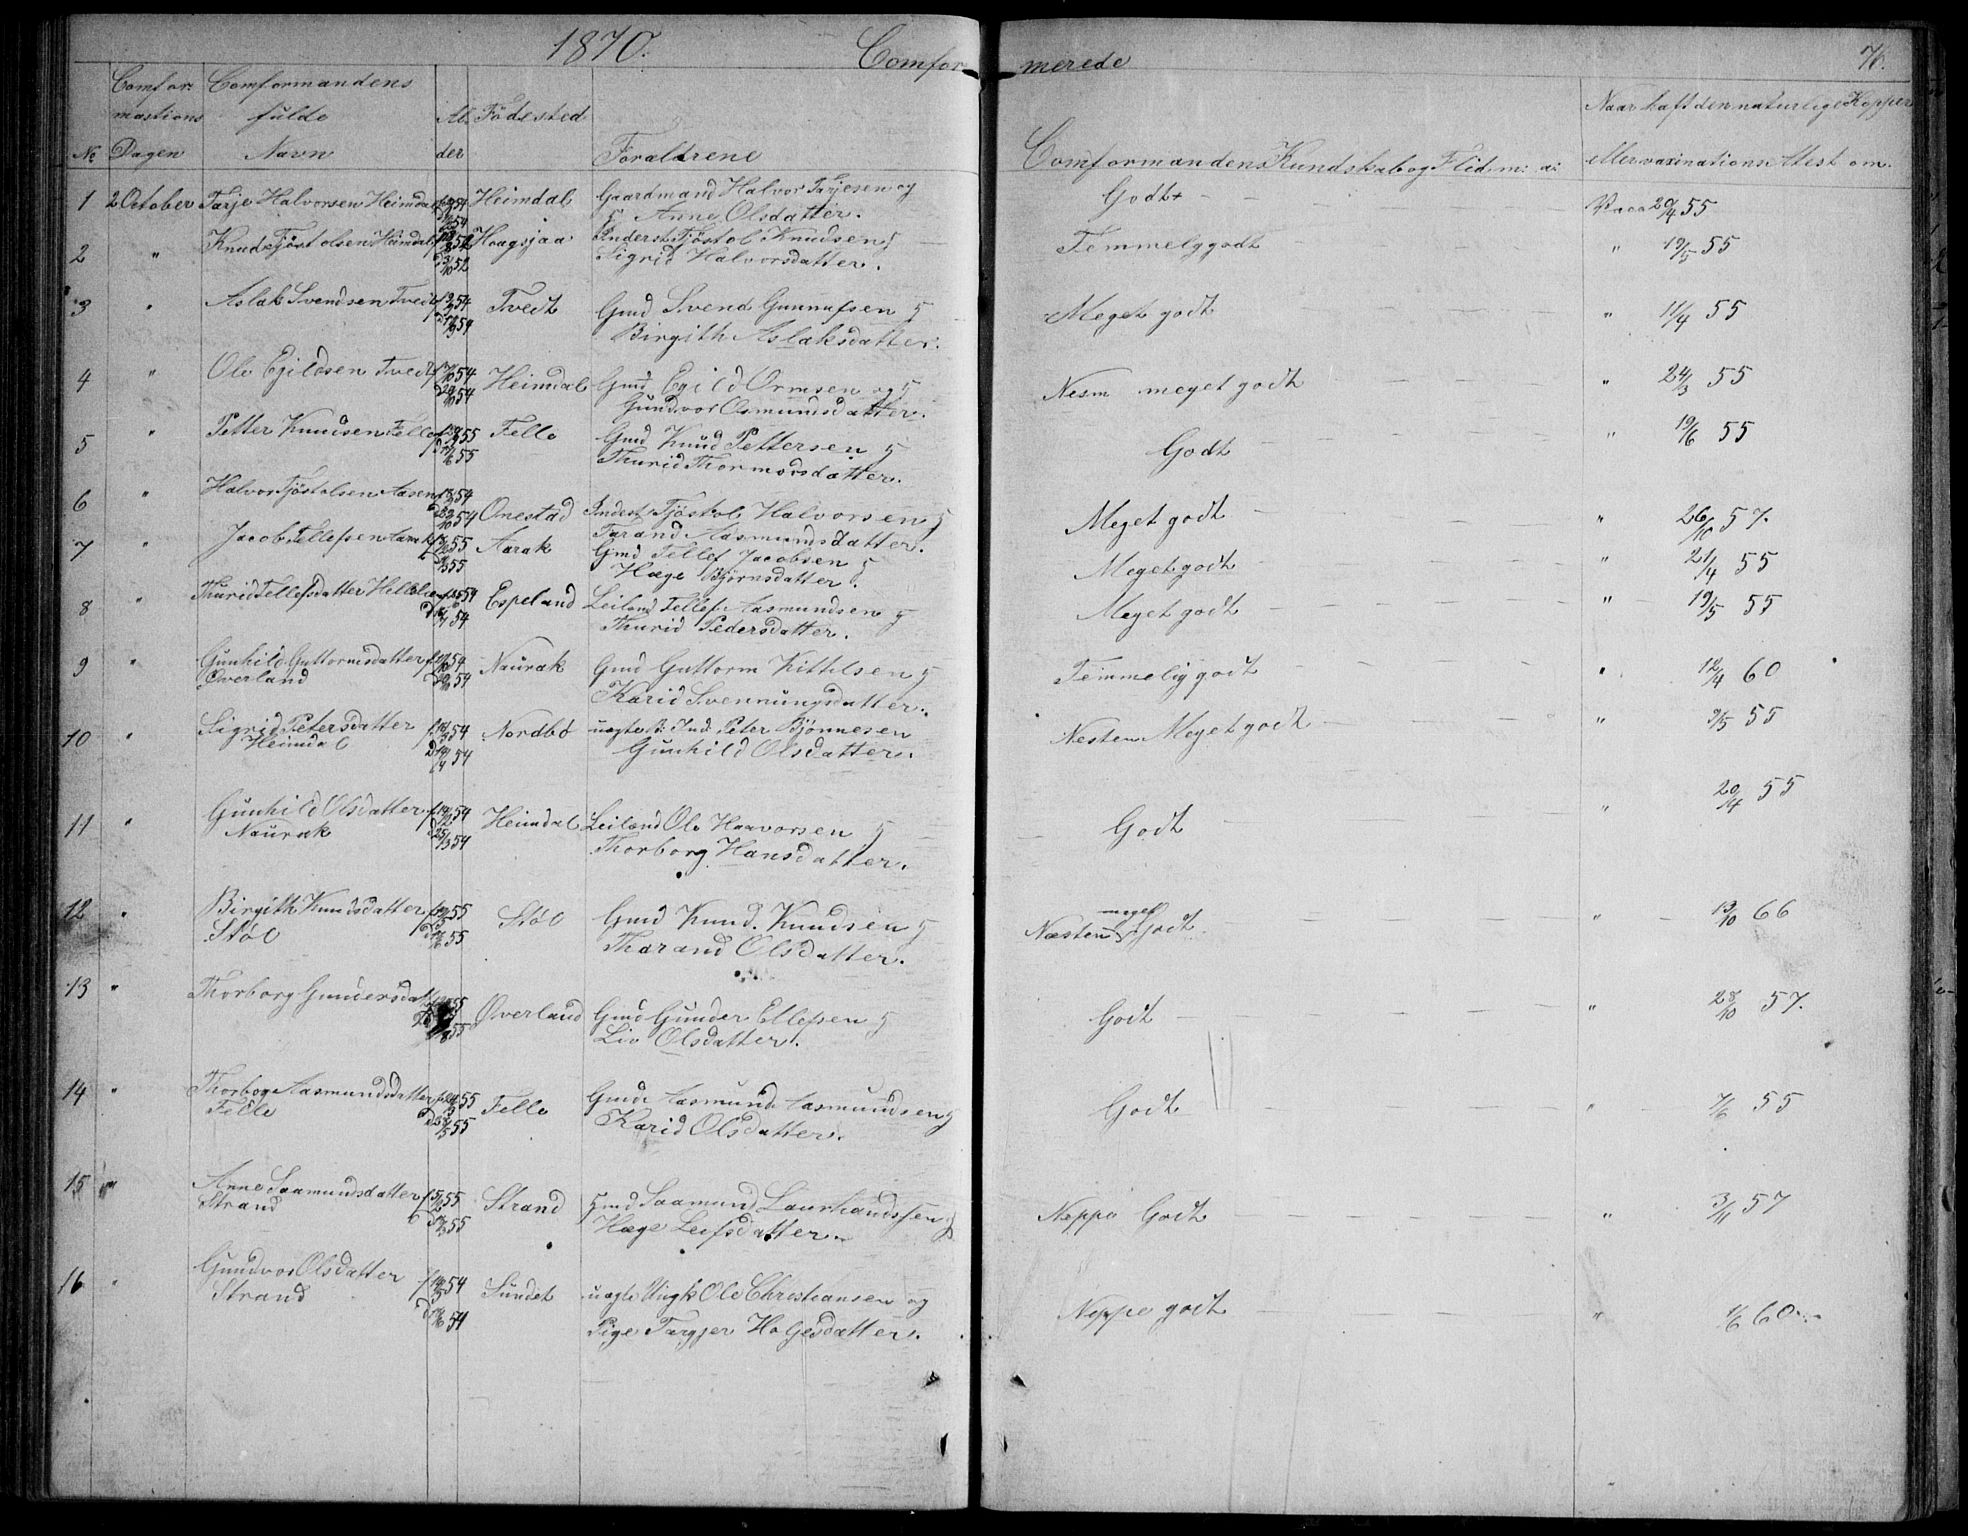 SAKO, Nissedal kirkebøker, G/Gb/L0002: Klokkerbok nr. II 2, 1863-1892, s. 76